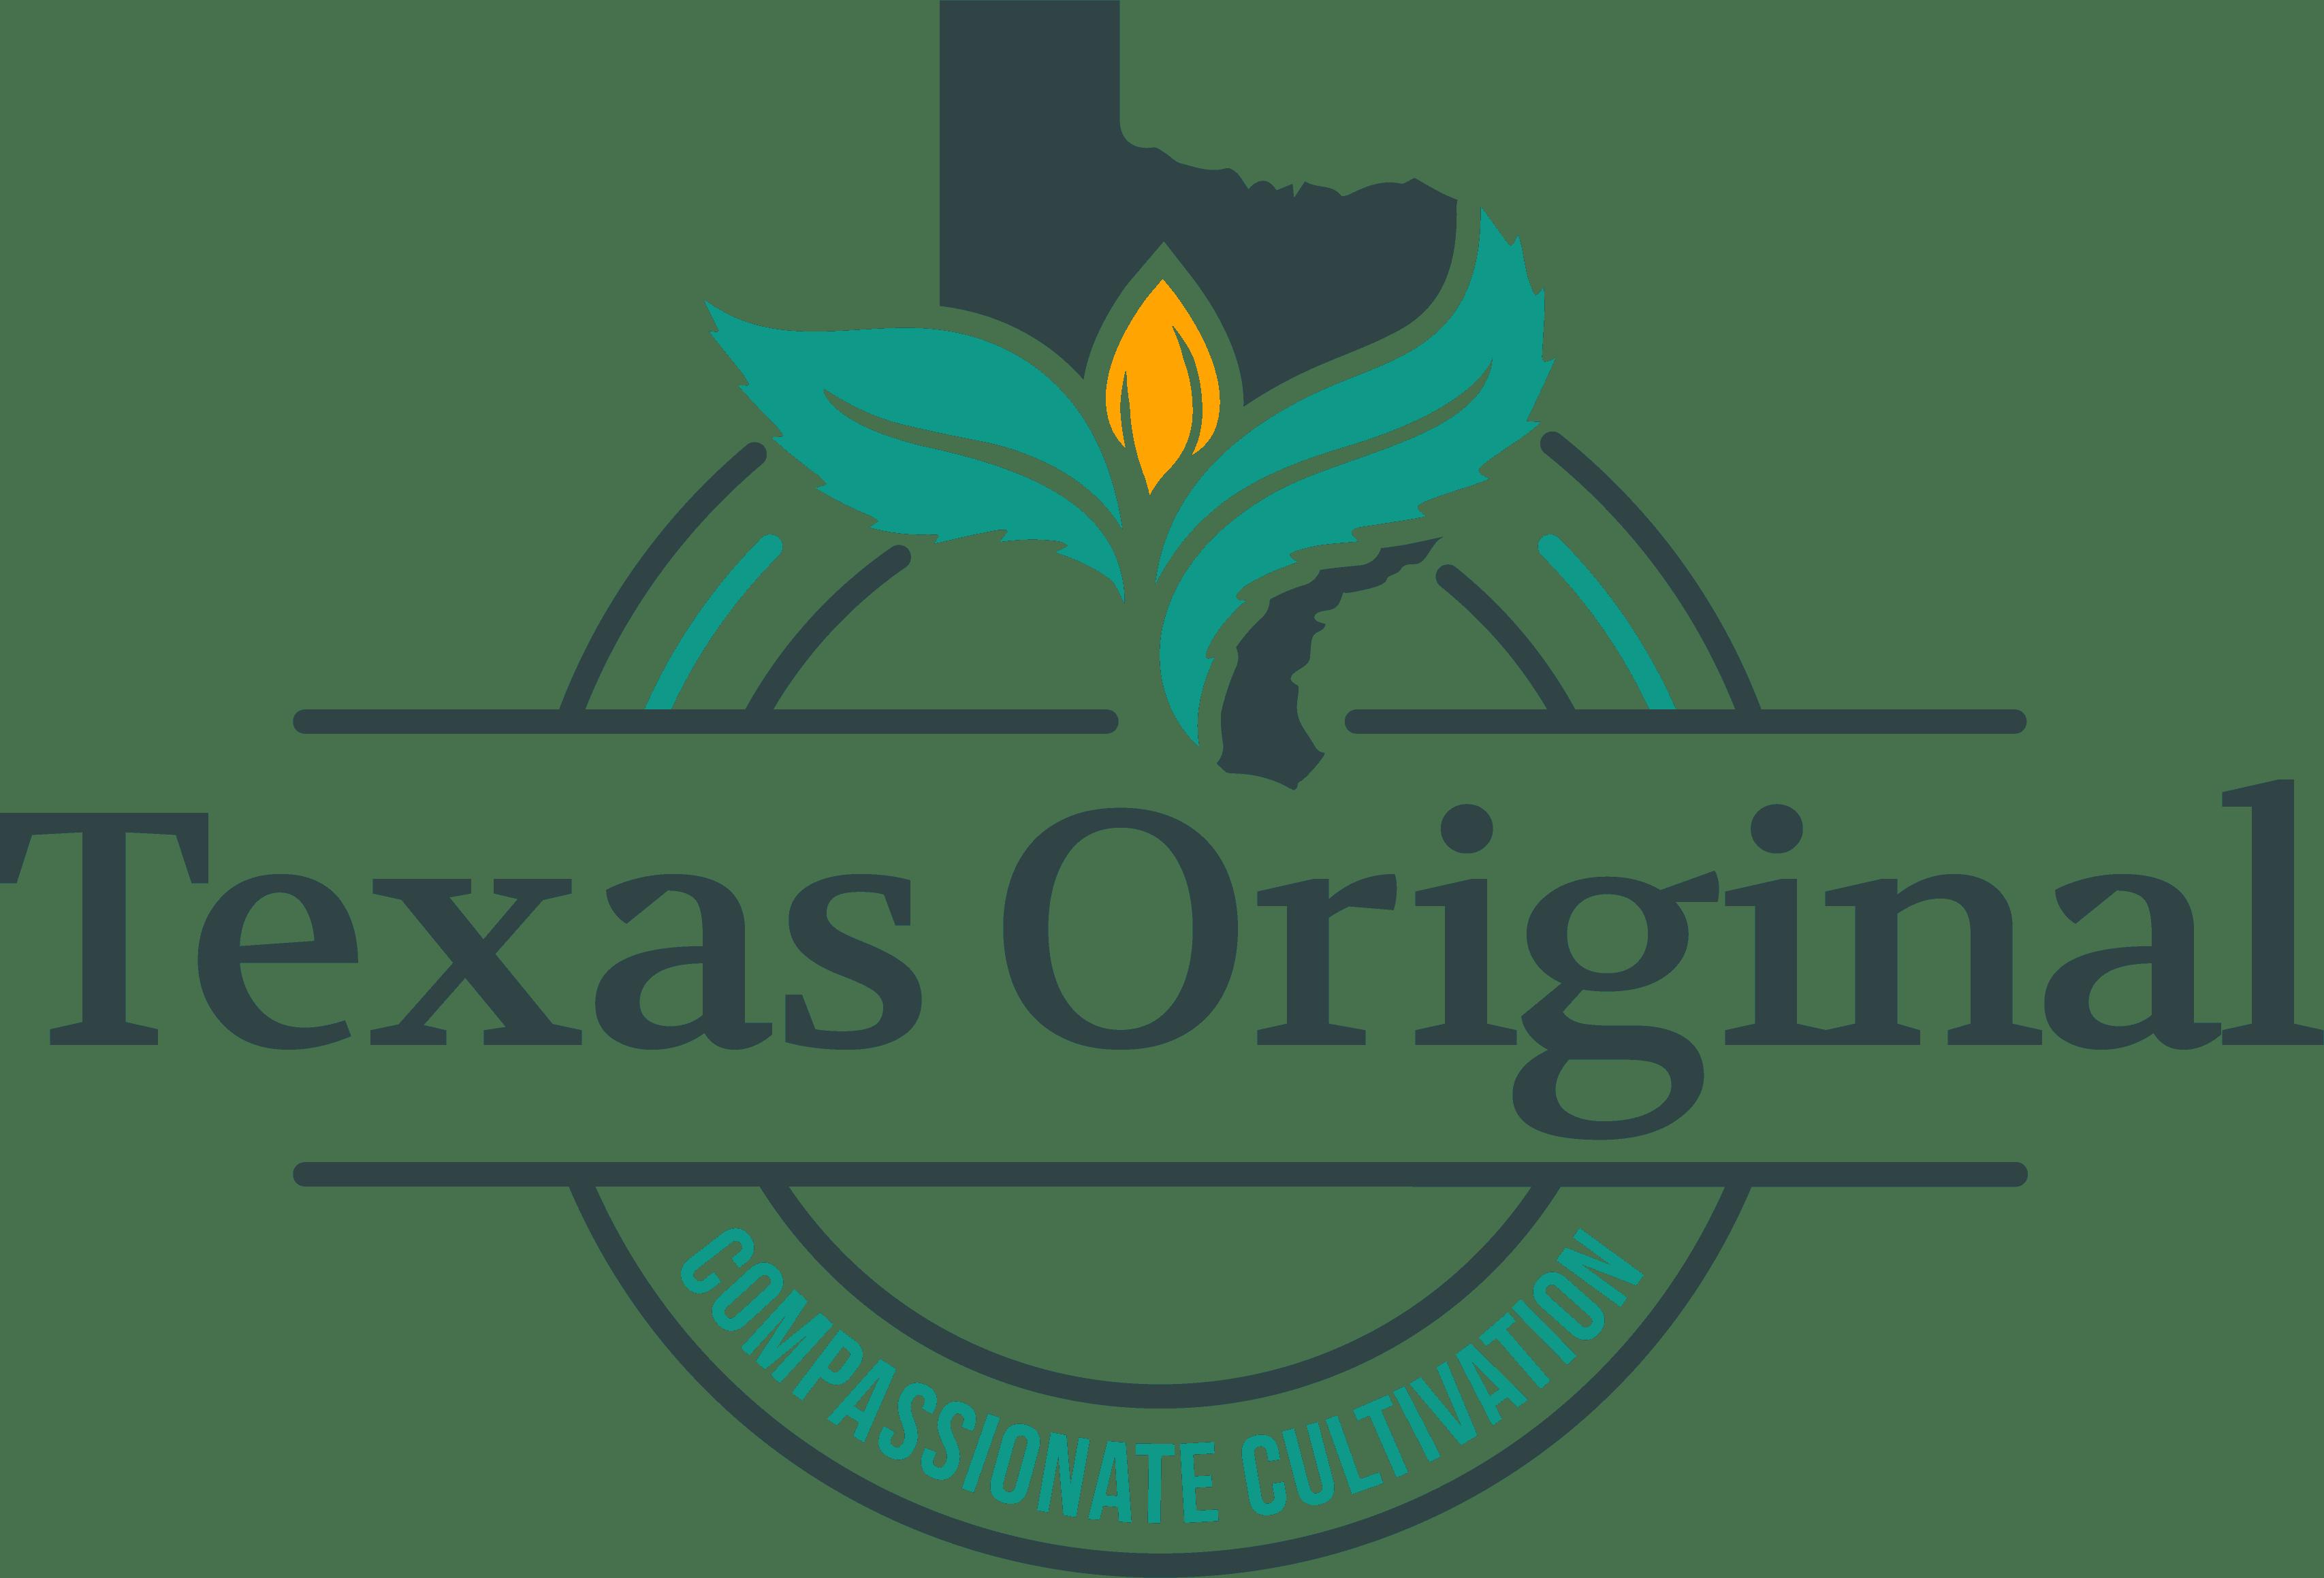 texas-original-stamp-logo-full-color-rgb